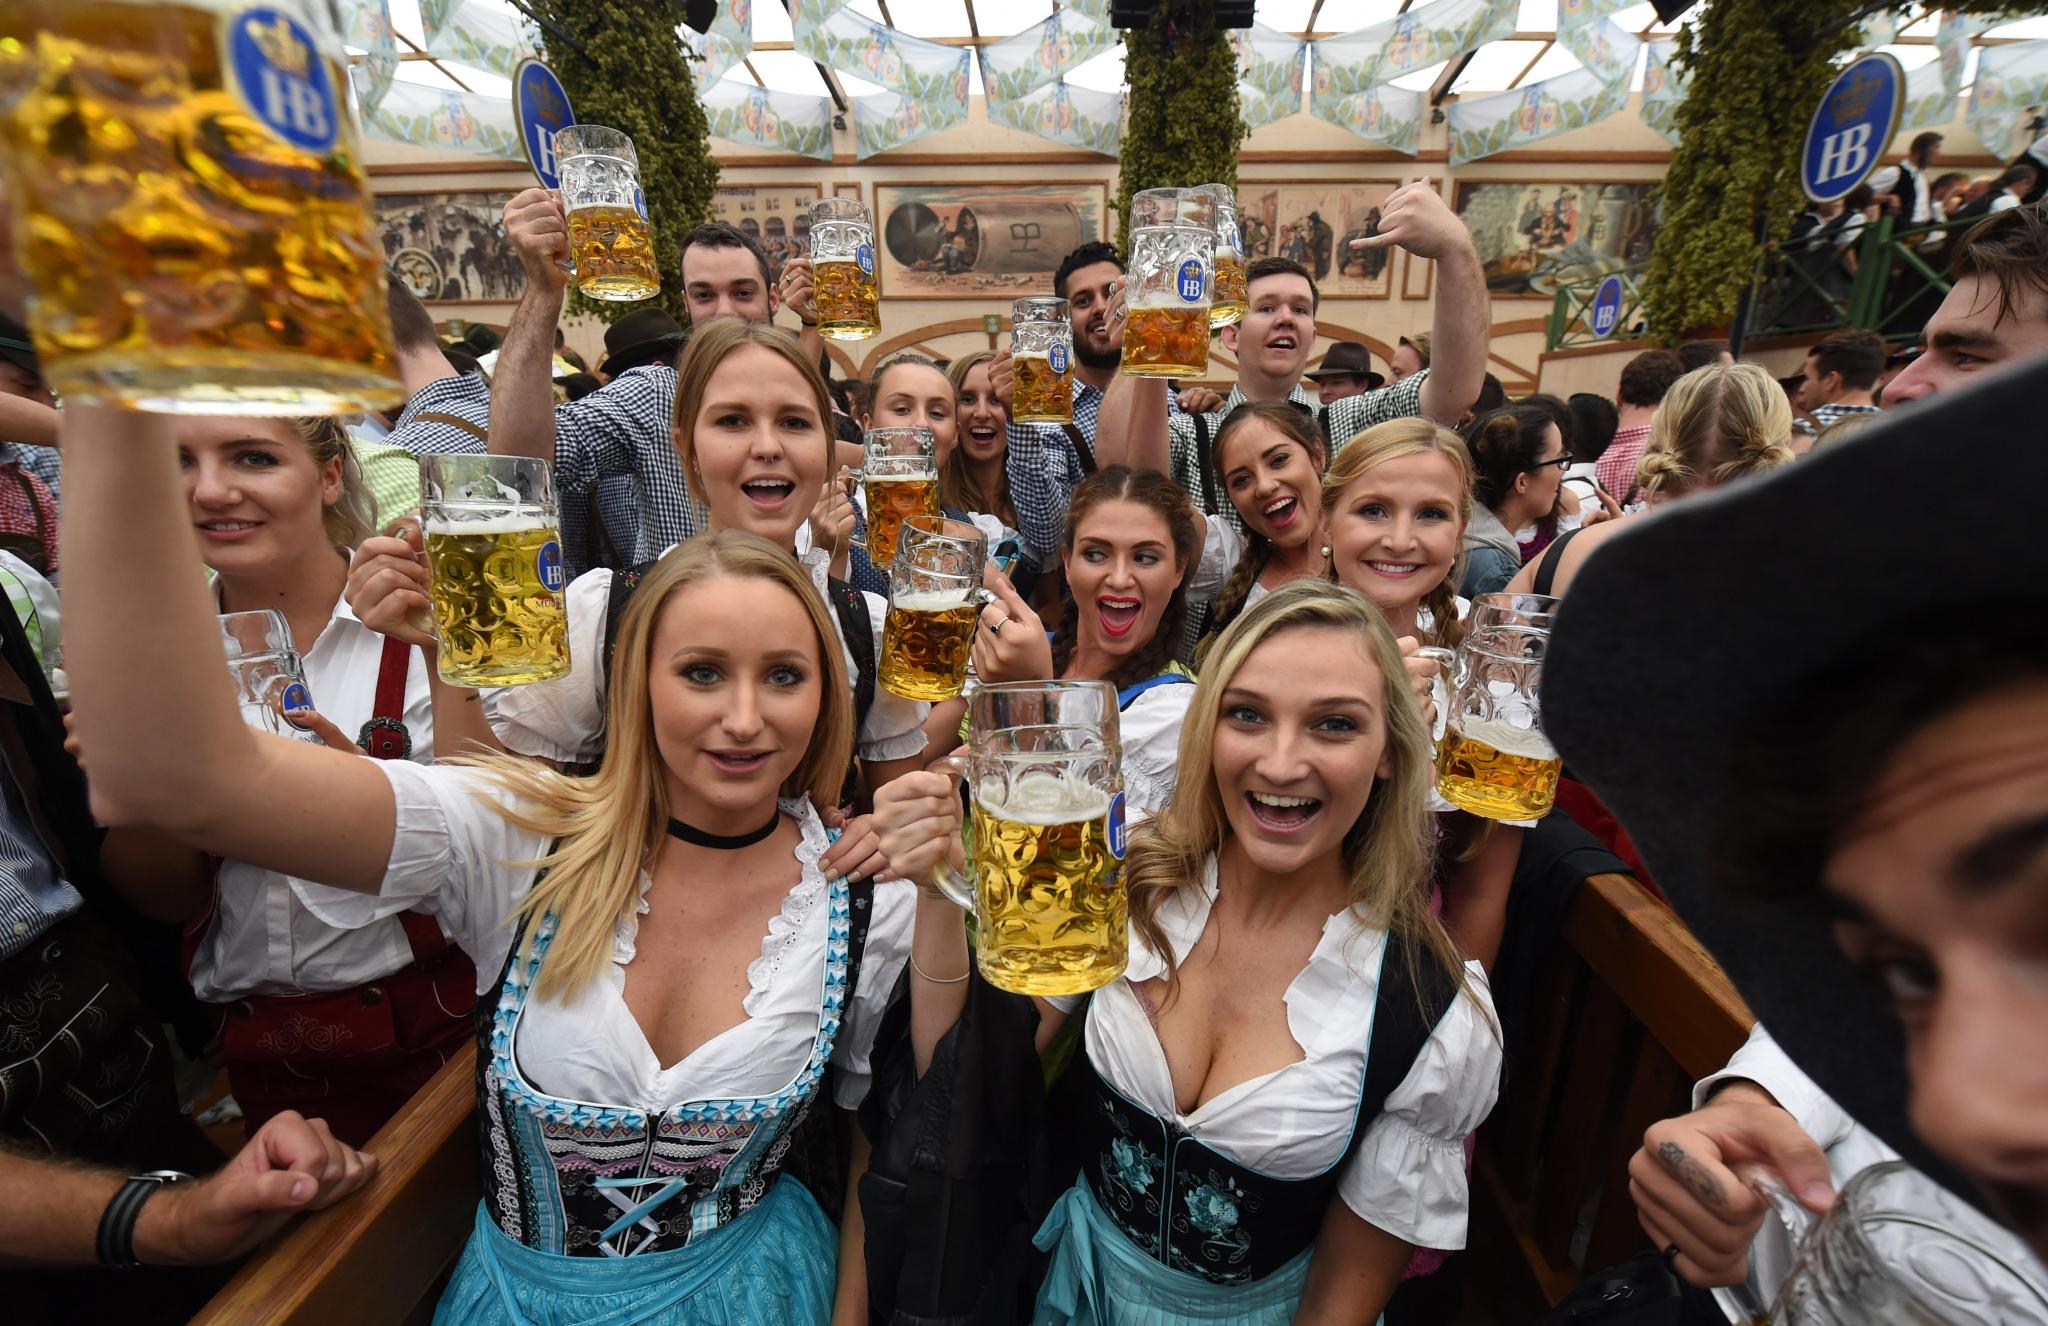 Oktoberfest 2016 kicks off in Munich - Houston Chronicle